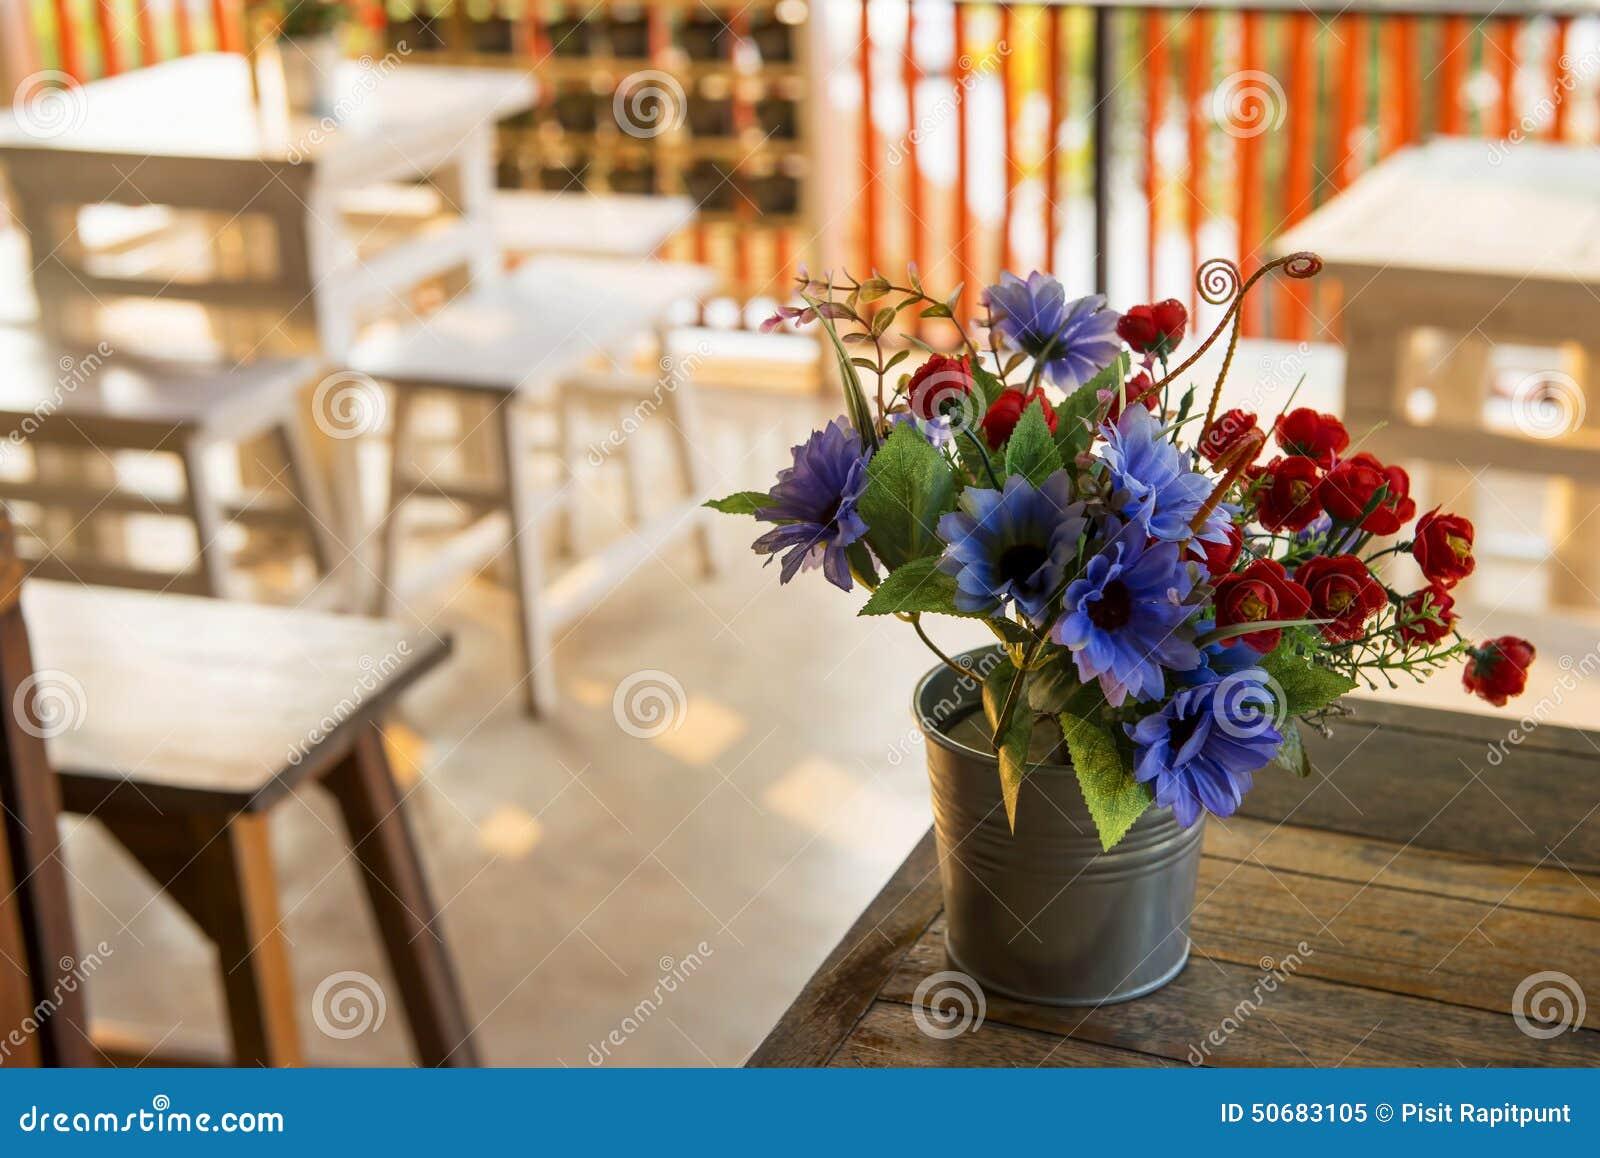 Download 在桌上的装饰花在咖啡店,泰国 库存图片. 图片 包括有 自然, 织品, 农村, 瓶子, 装饰, 芬芳, 叶子 - 50683105